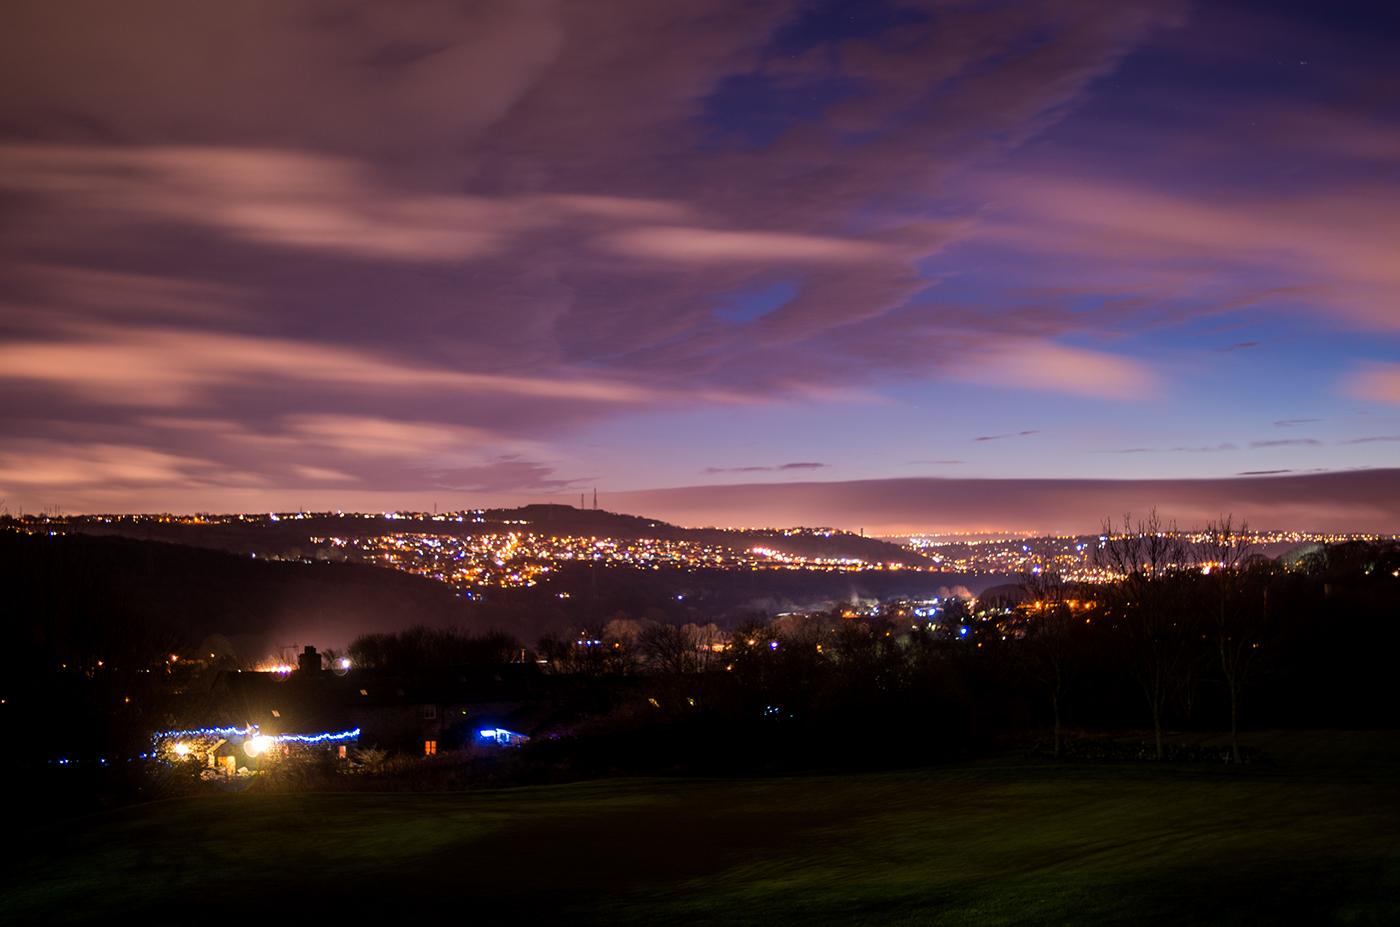 Night Across The Valley